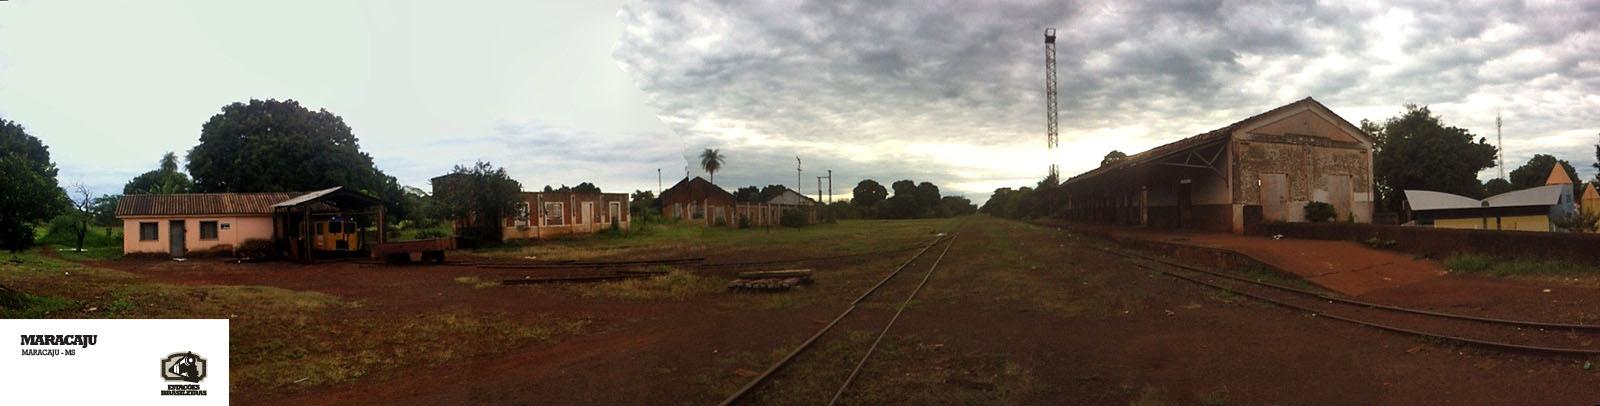 PANORAMICA_MARACAJU02